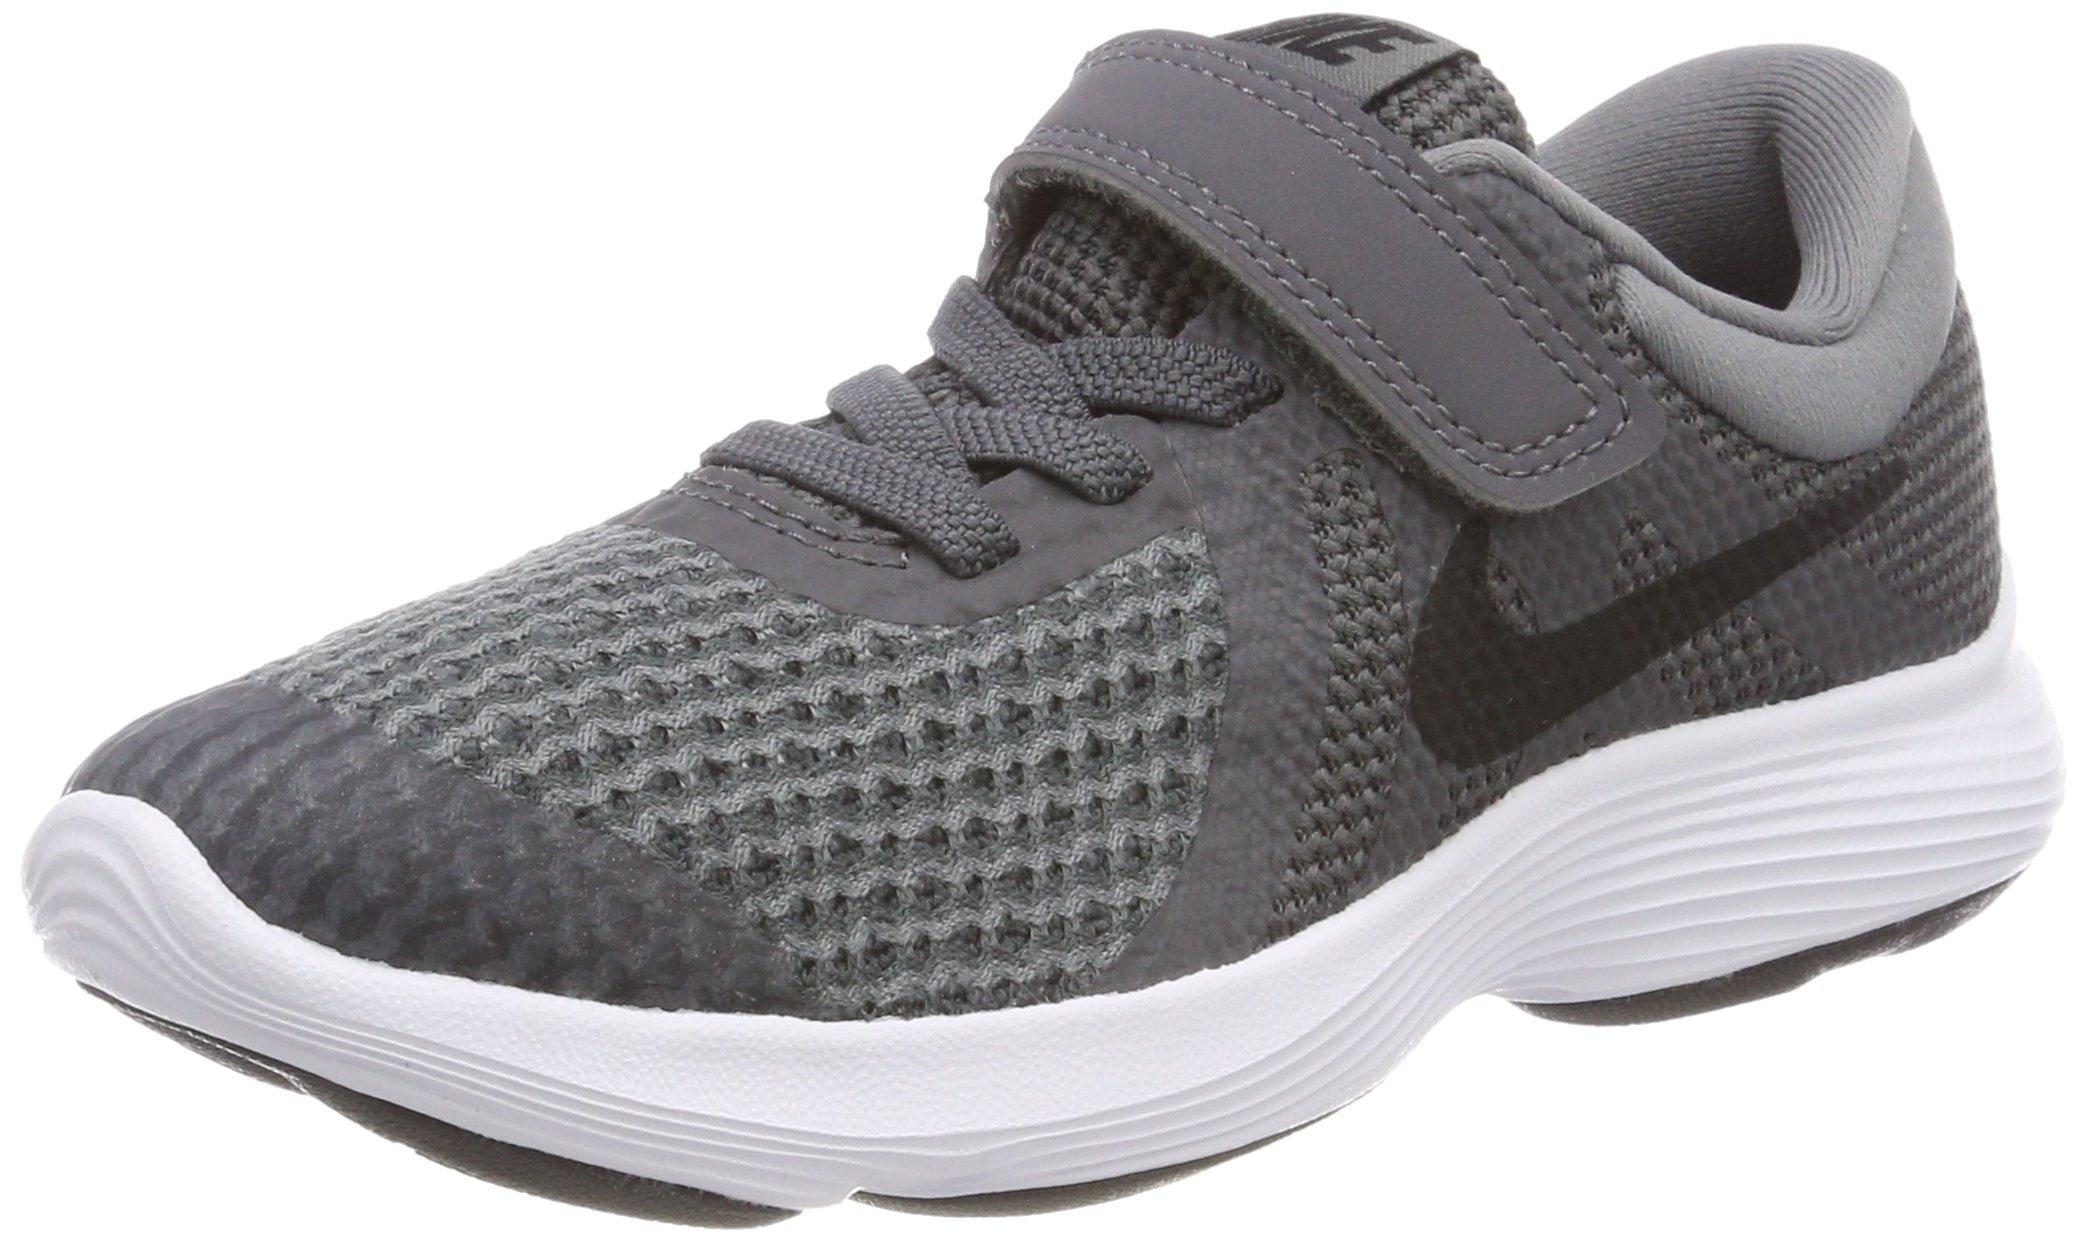 Nike Boys' Revolution 4 (PSV) Running Shoe, Dark Black-Cool Grey-White, 2.5Y Regular US Little Kid by Nike